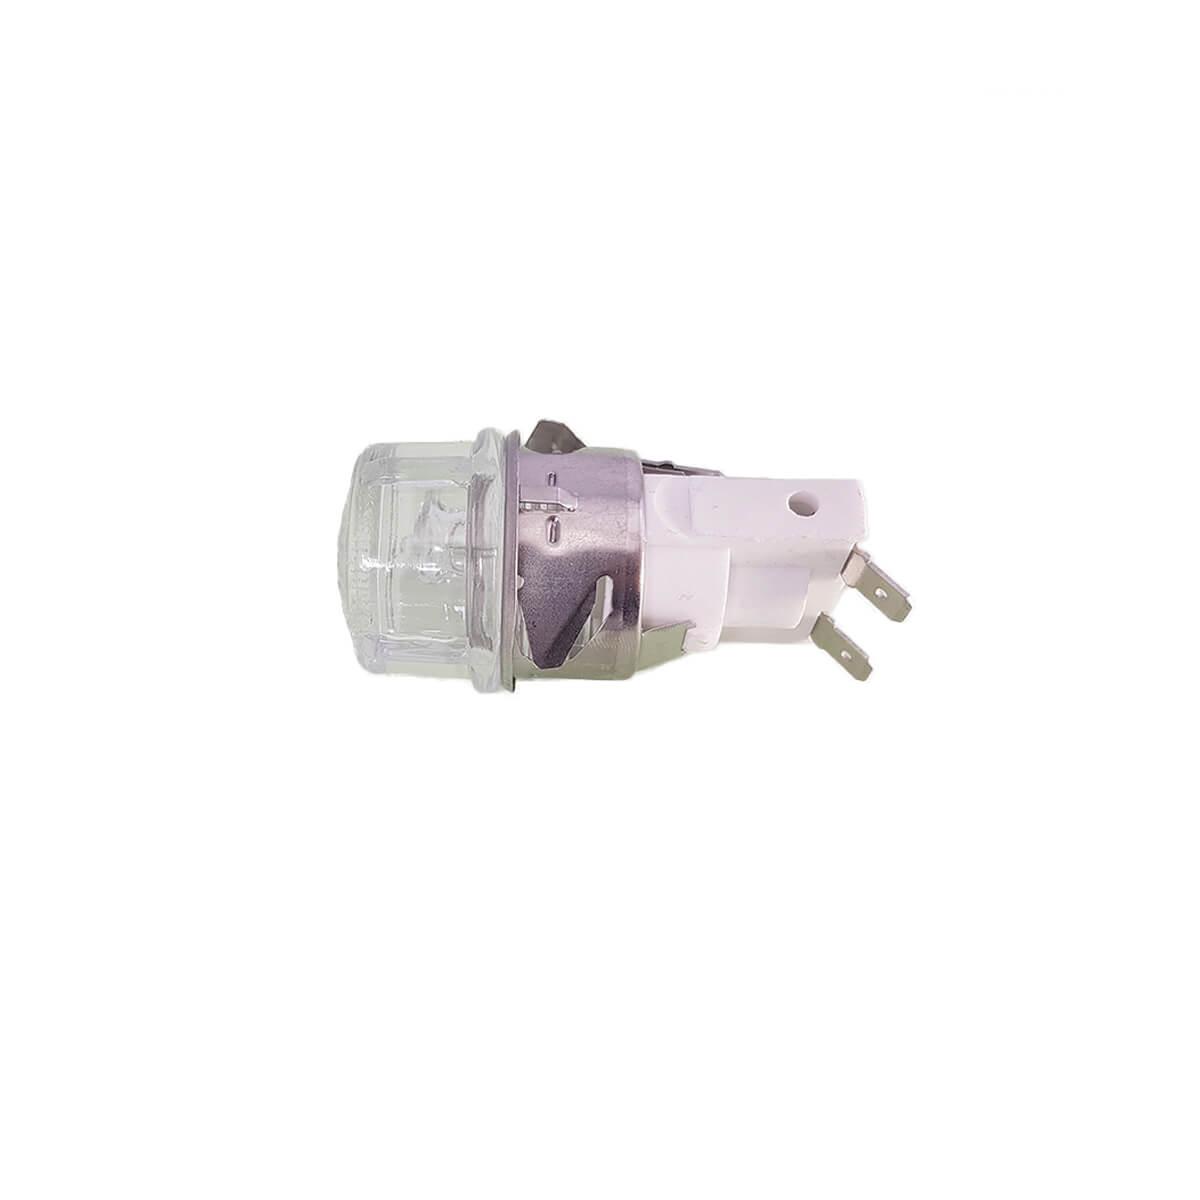 Conjunto Soquete Com Lâmpada Forno Elétrico Electrolux OE7MX OE7MB OE7TX  - 261257700030